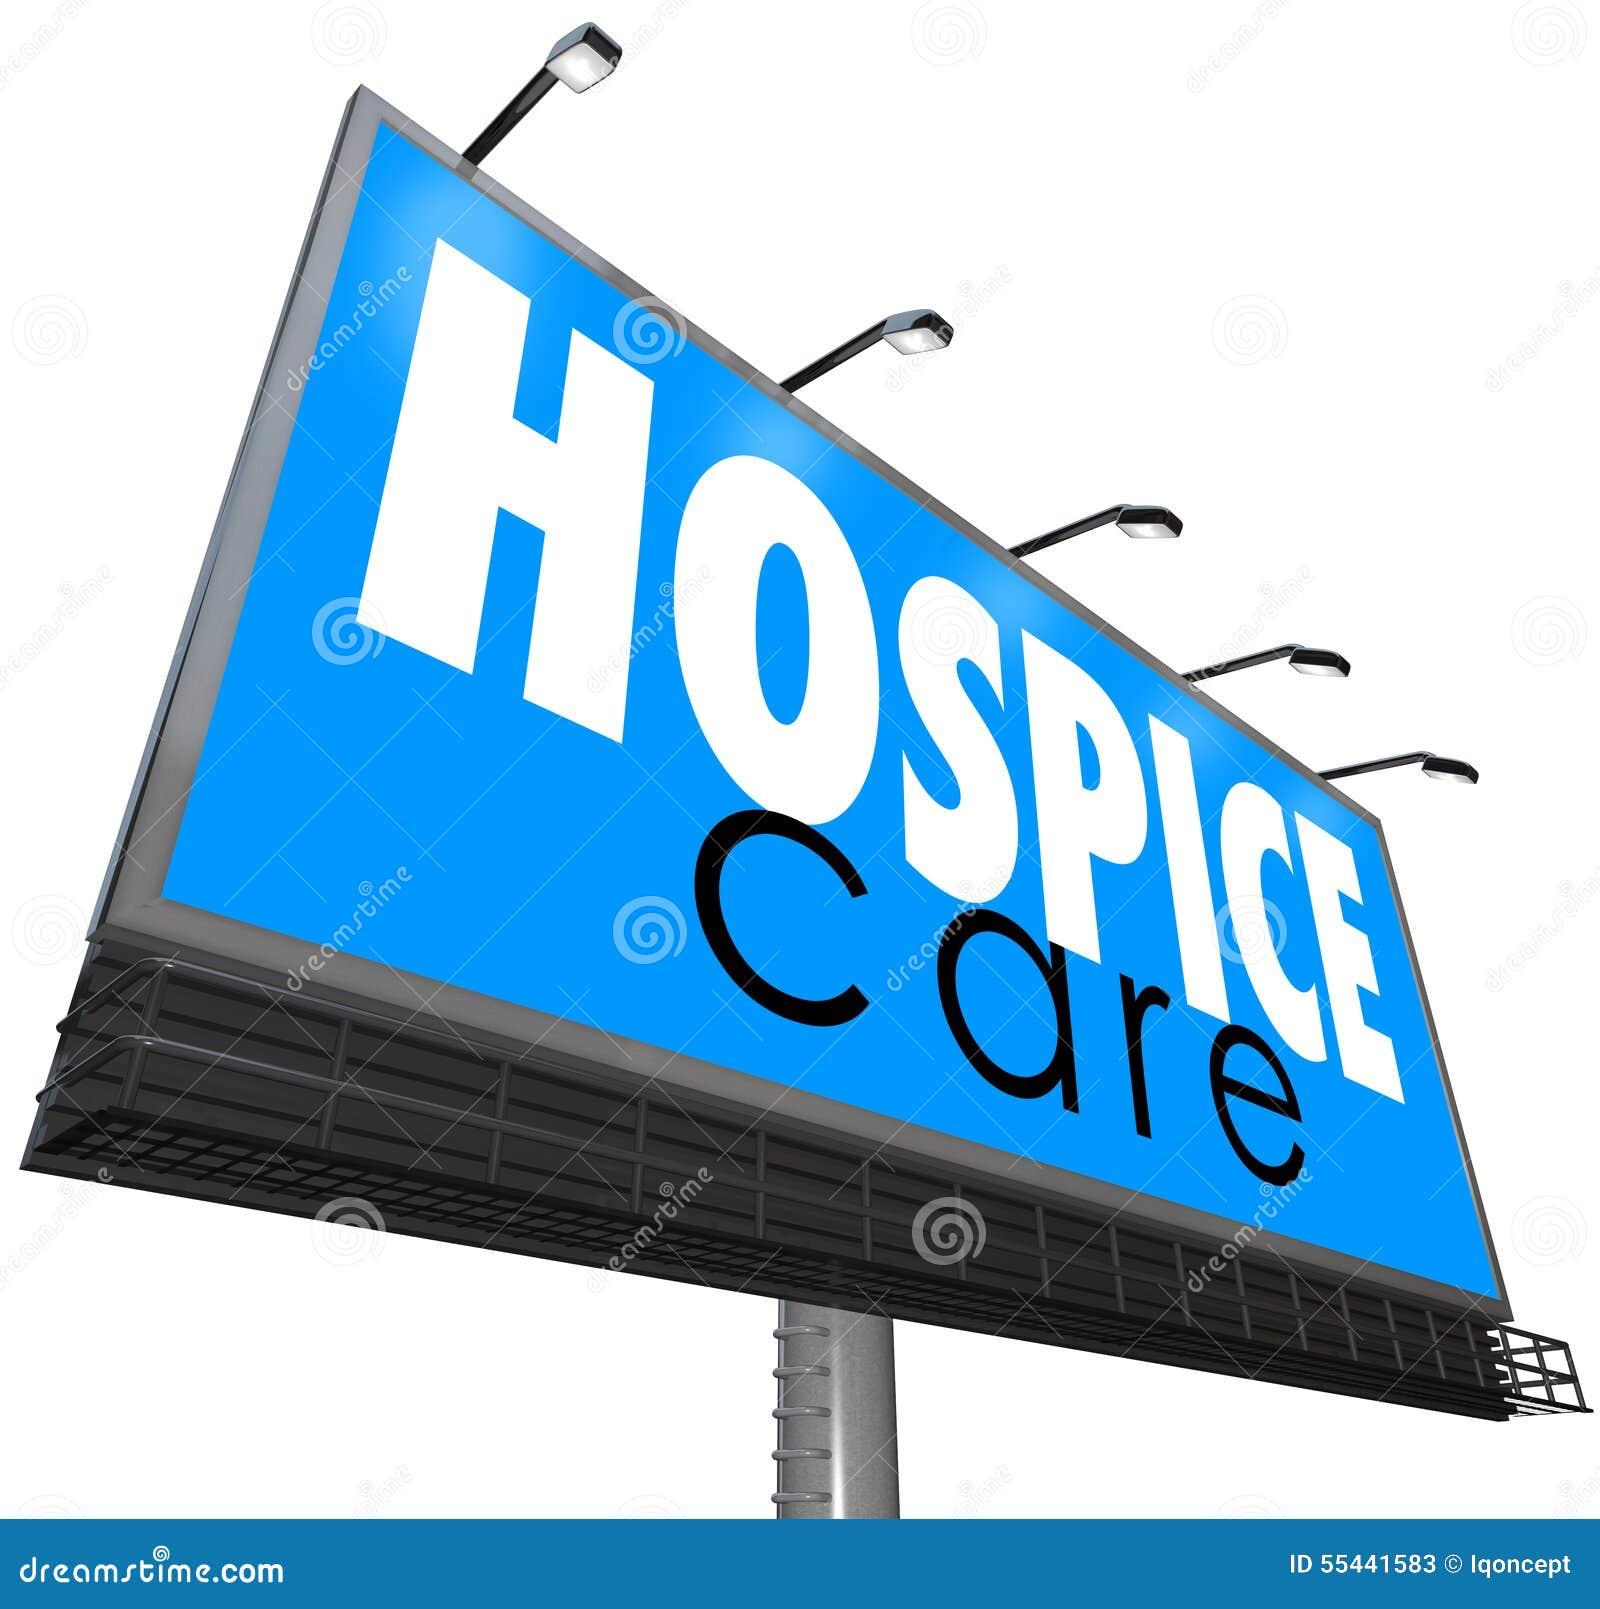 Home Design Ideas For Seniors: Hospice Care Billboard Advertise Home Nursing Medical